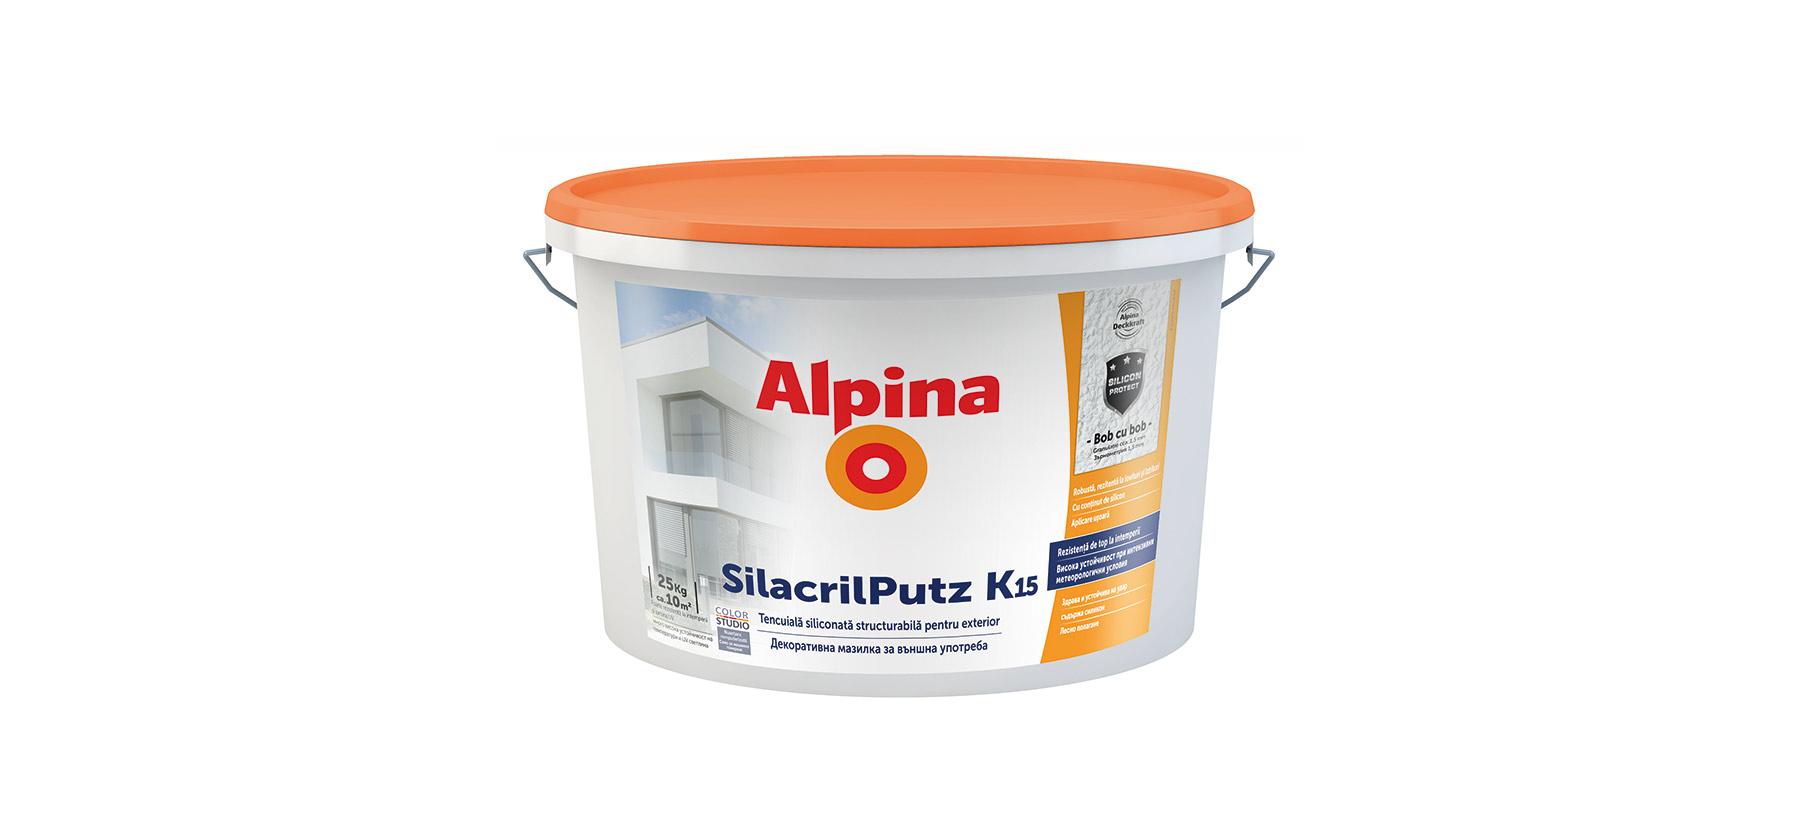 Alpina-SilacrilPutz-K15-540h